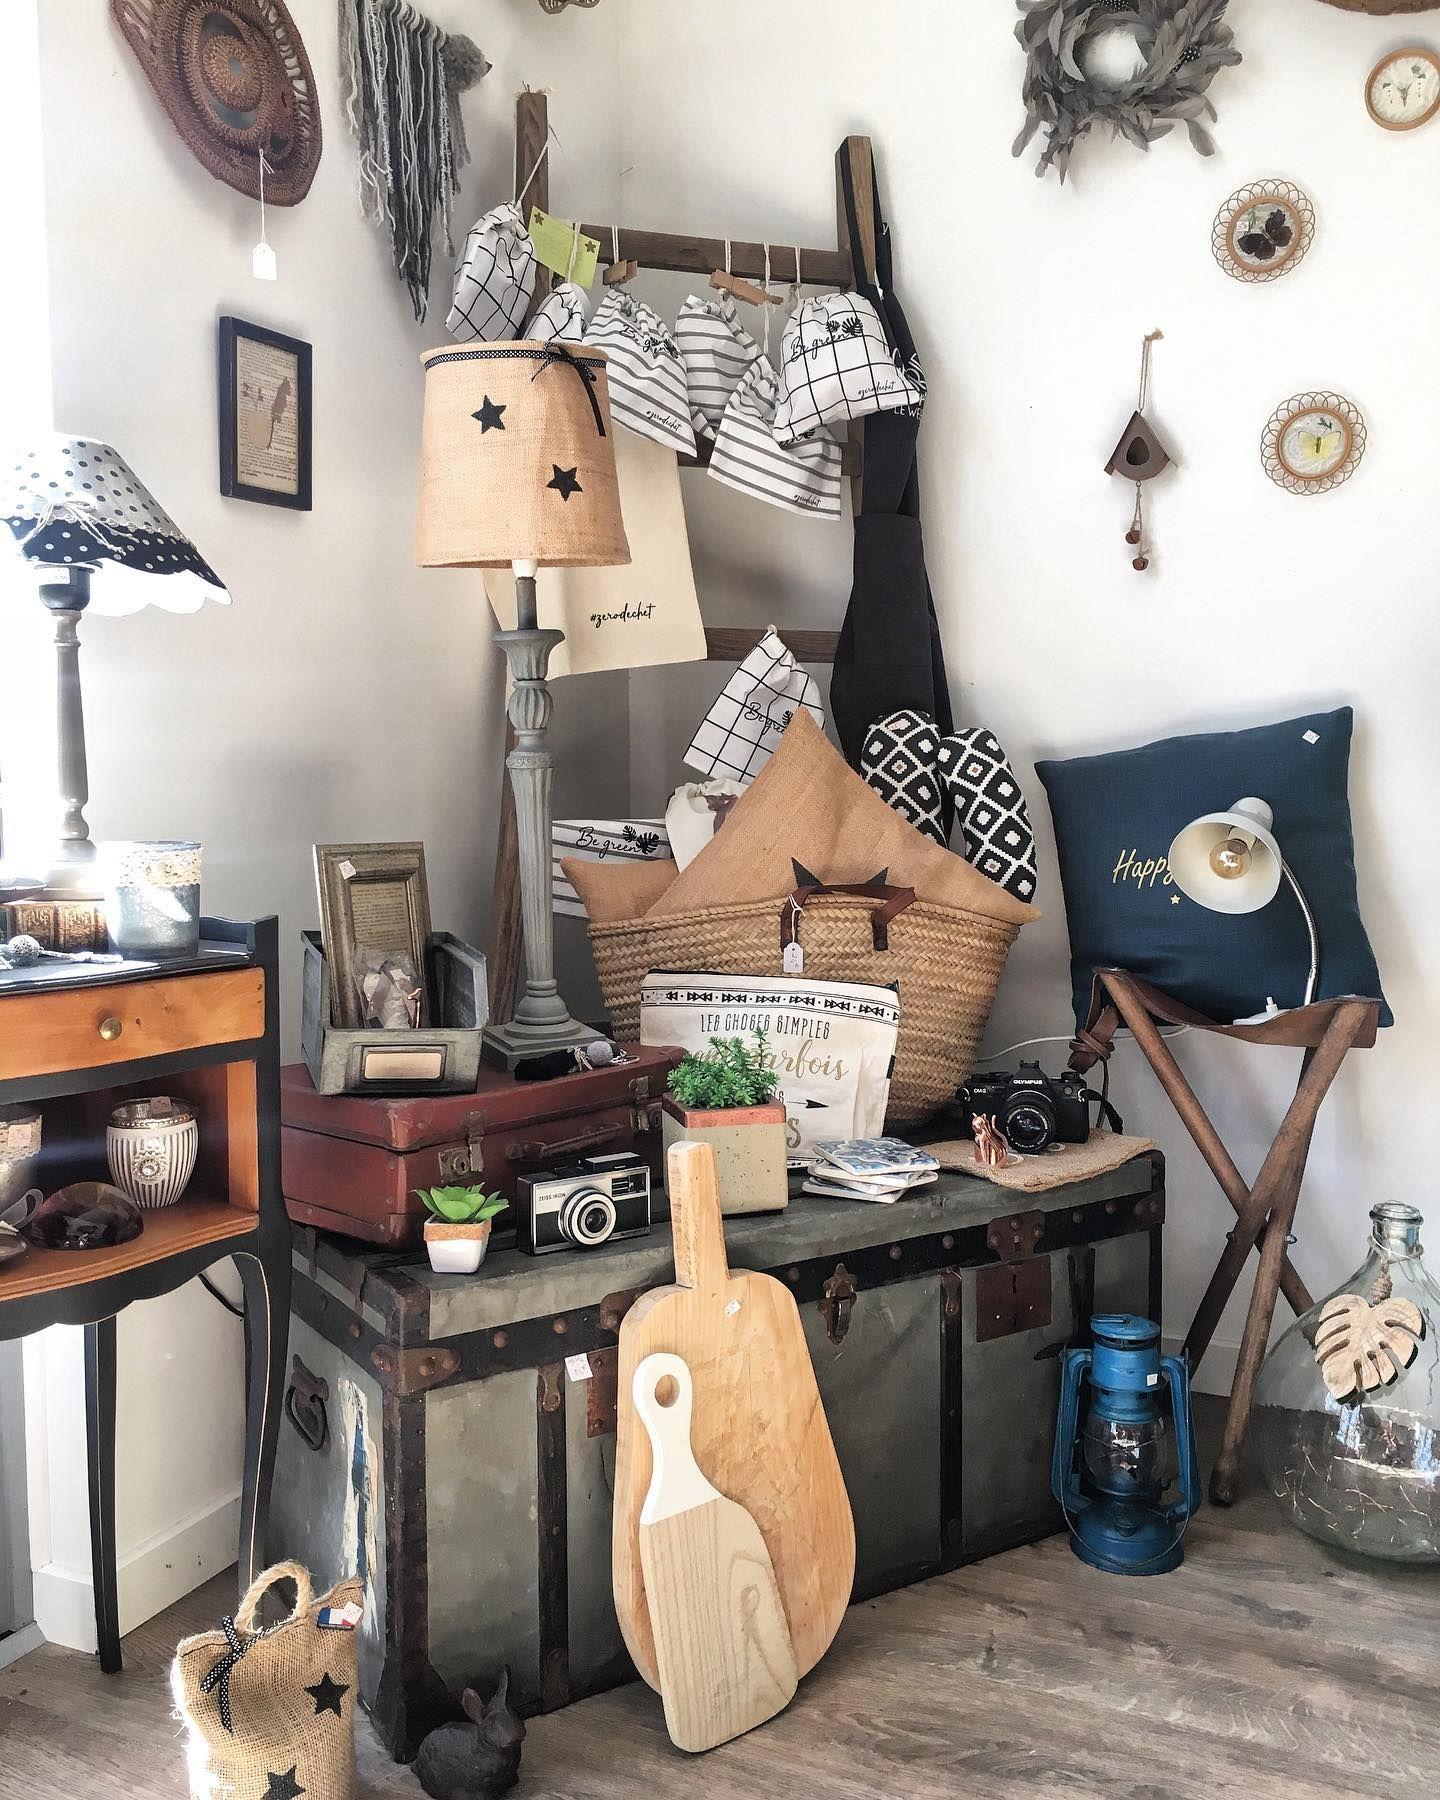 B R O C A N T E A D D I C T Decoration Malle Brut Brocante Vintage Homedecor Conceptstore Retourdechine Decoaddict Retourdechine Jourdec In 2020